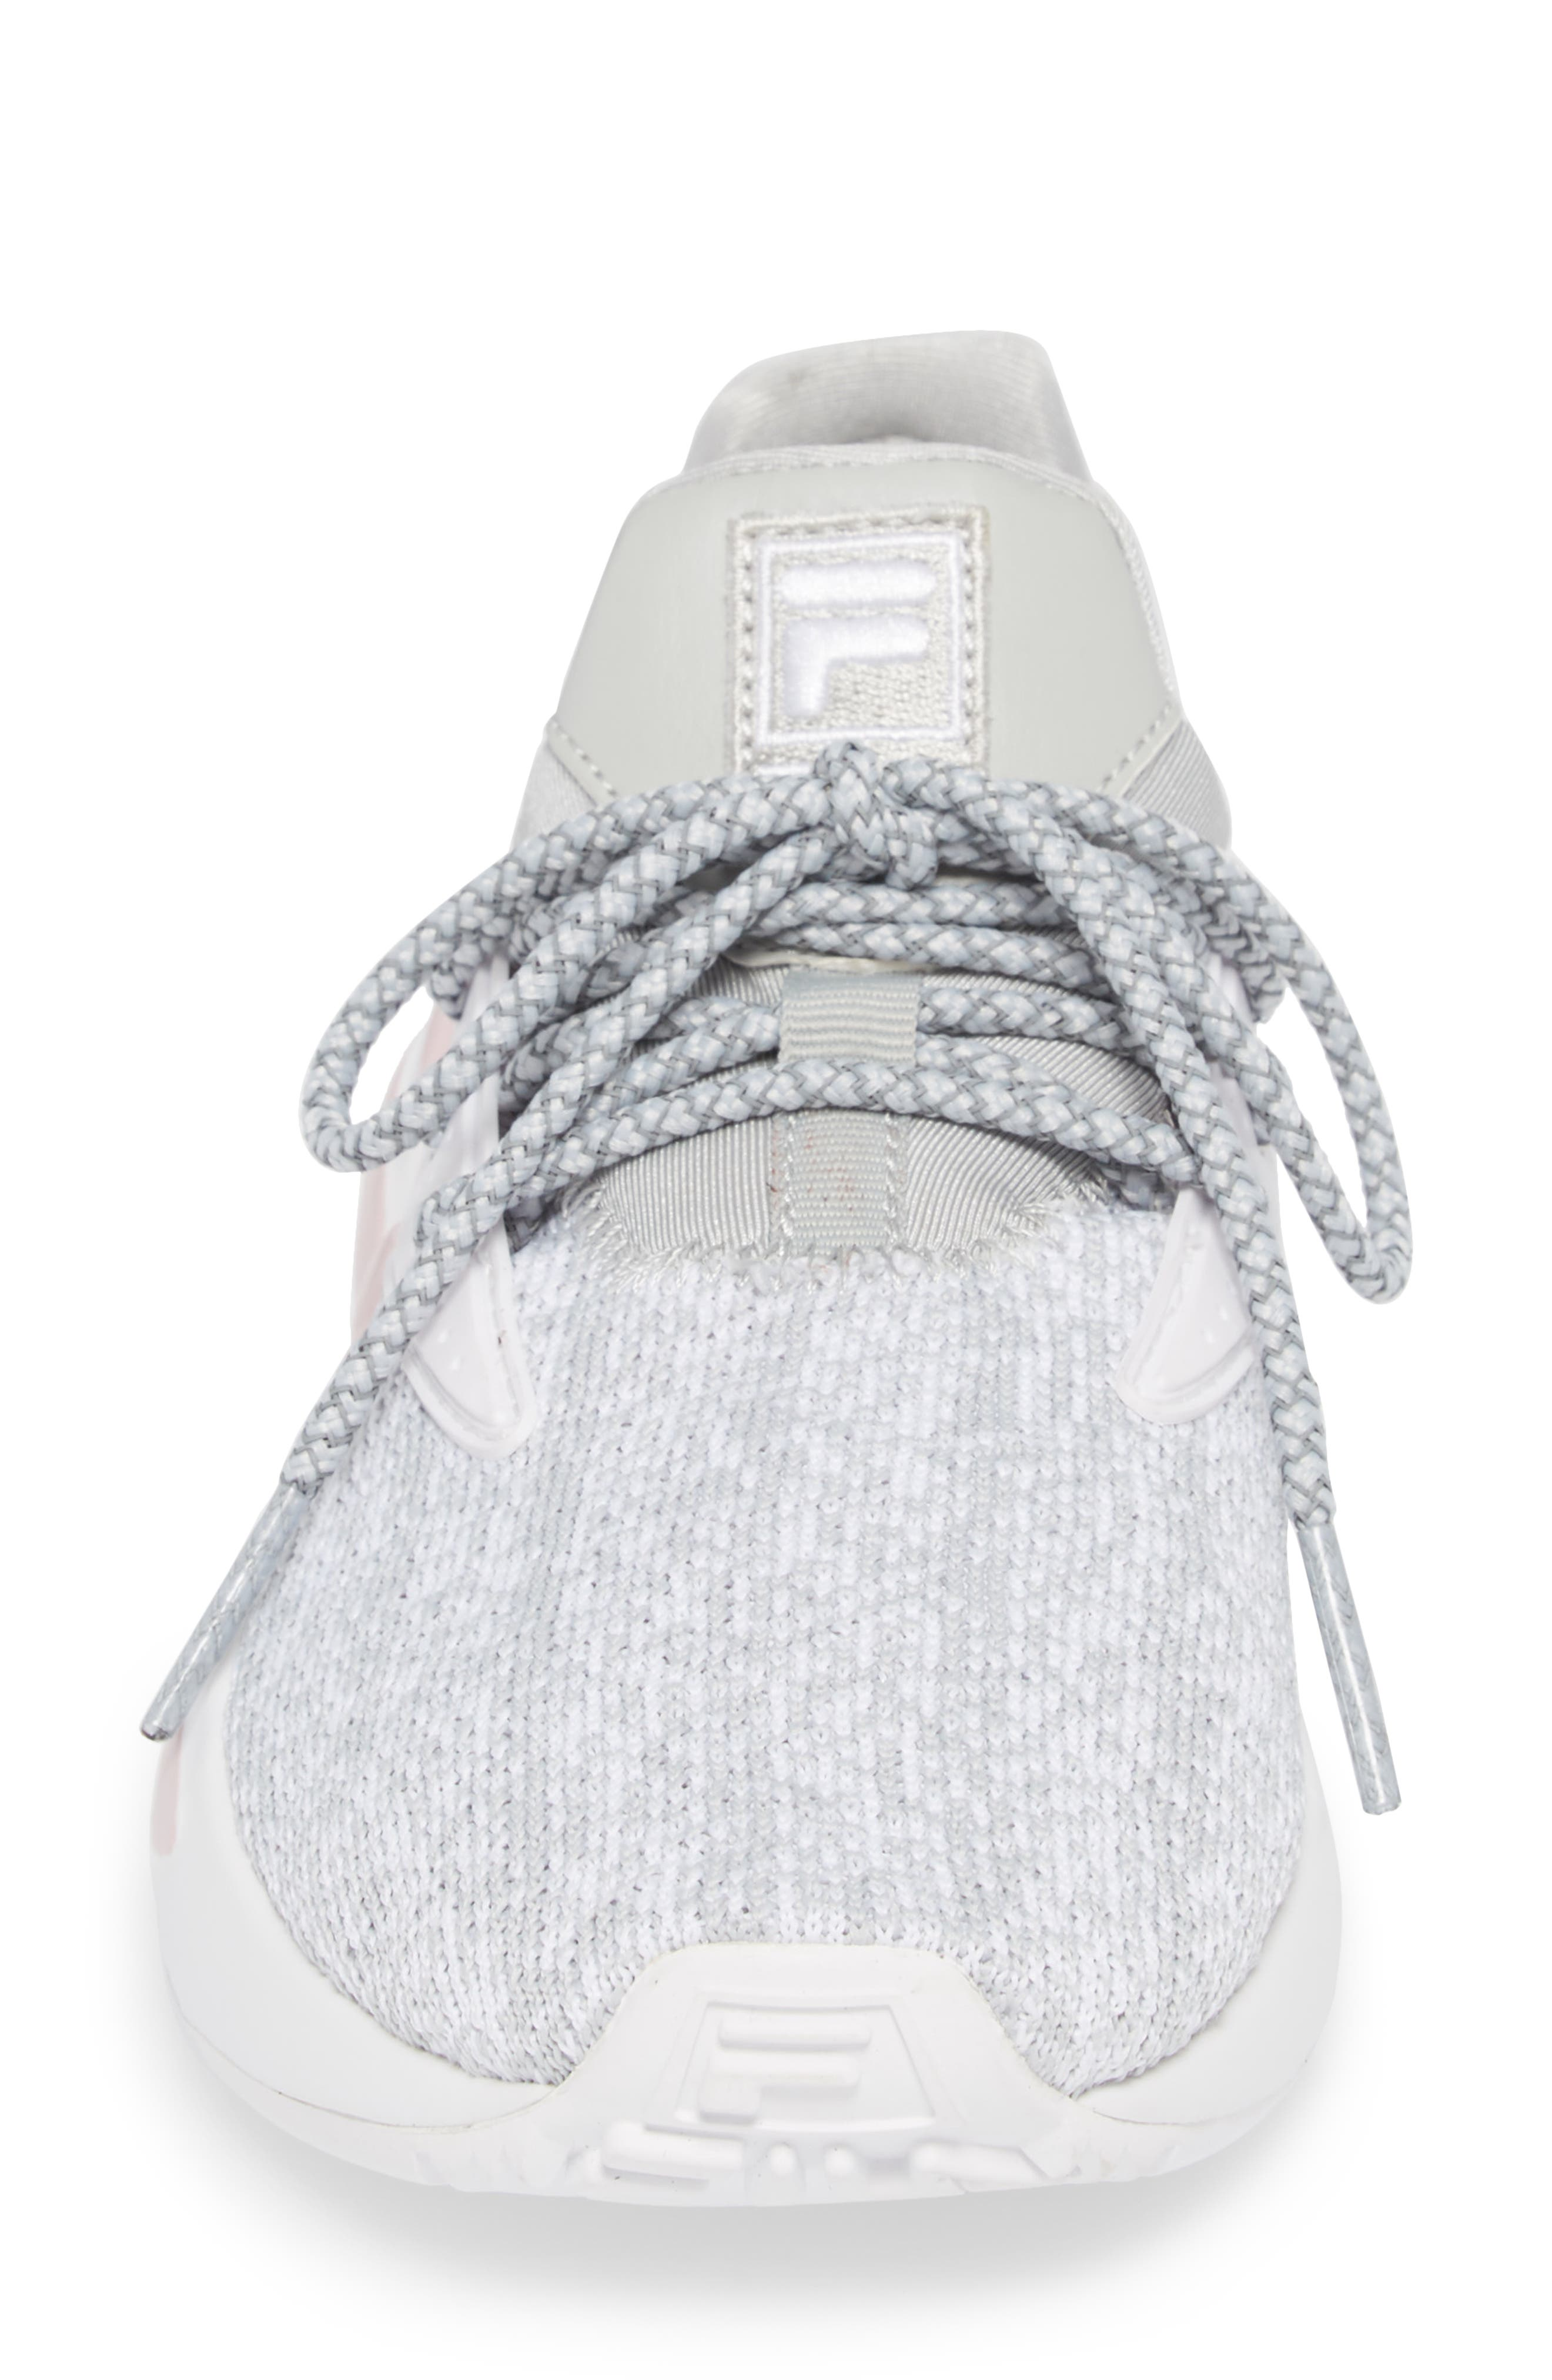 Mindbreaker 2.0 Sneaker,                             Alternate thumbnail 4, color,                             070